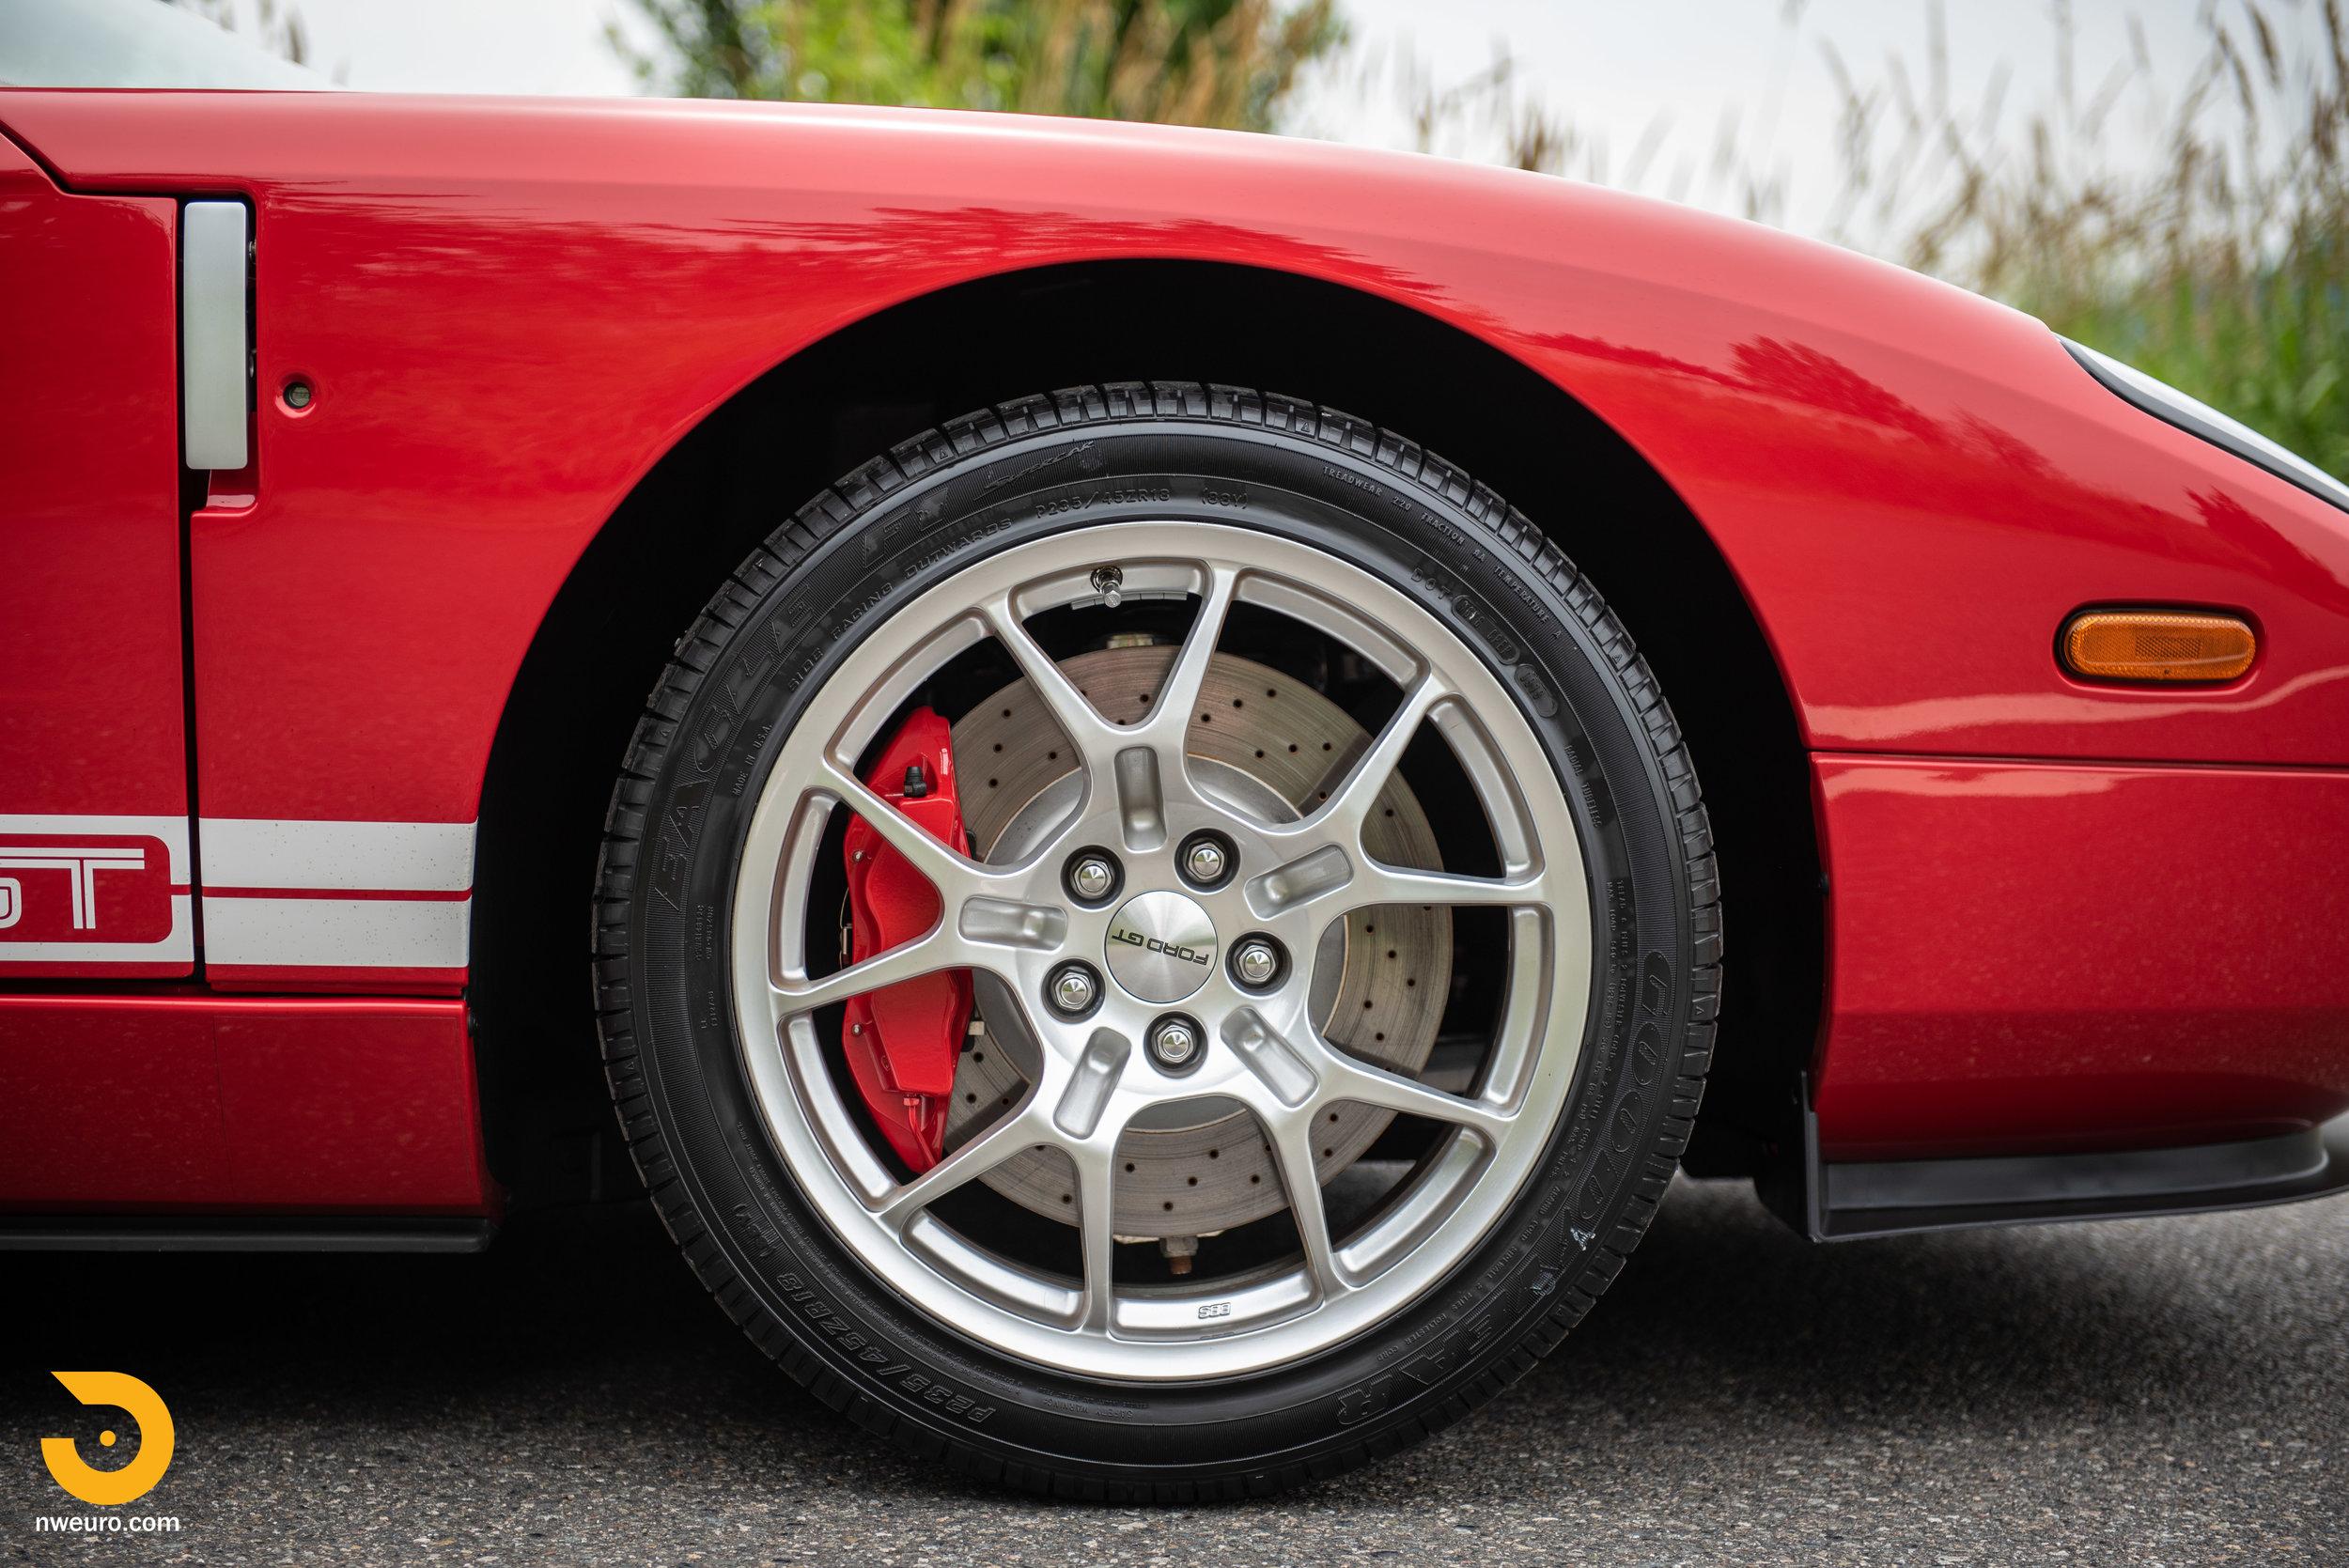 2005 Ford GT Red-98.jpg